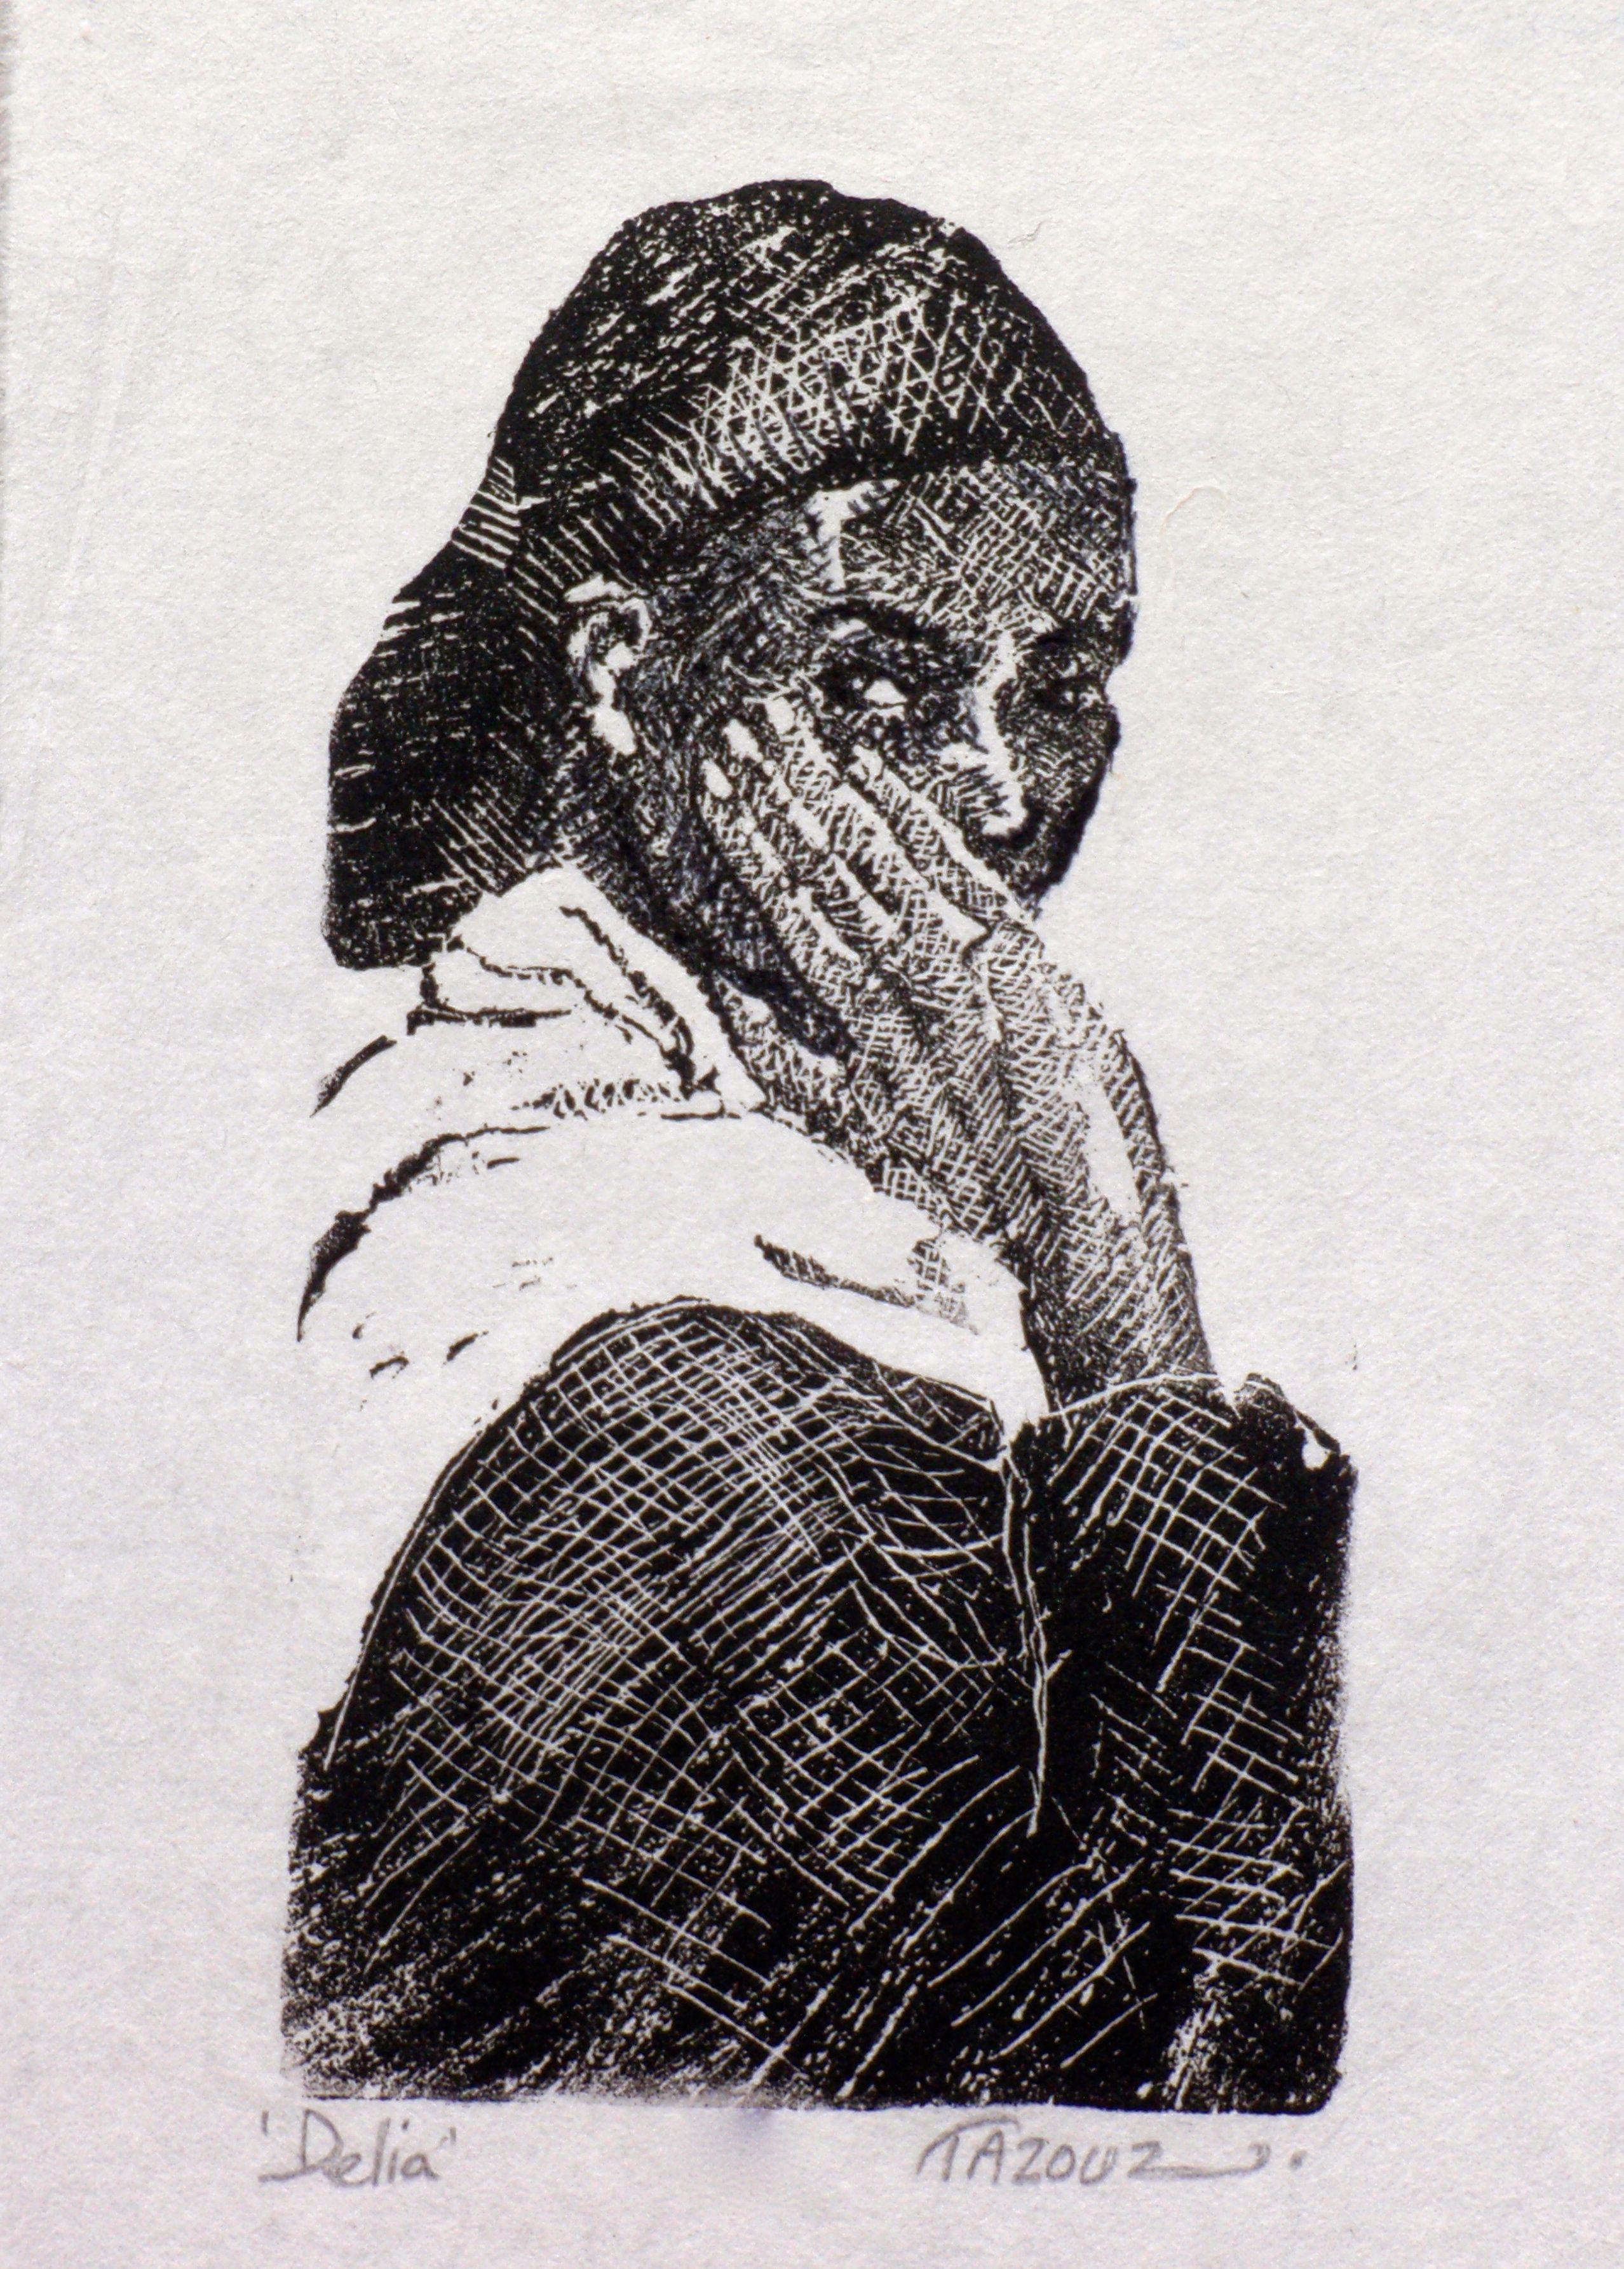 'Delia'